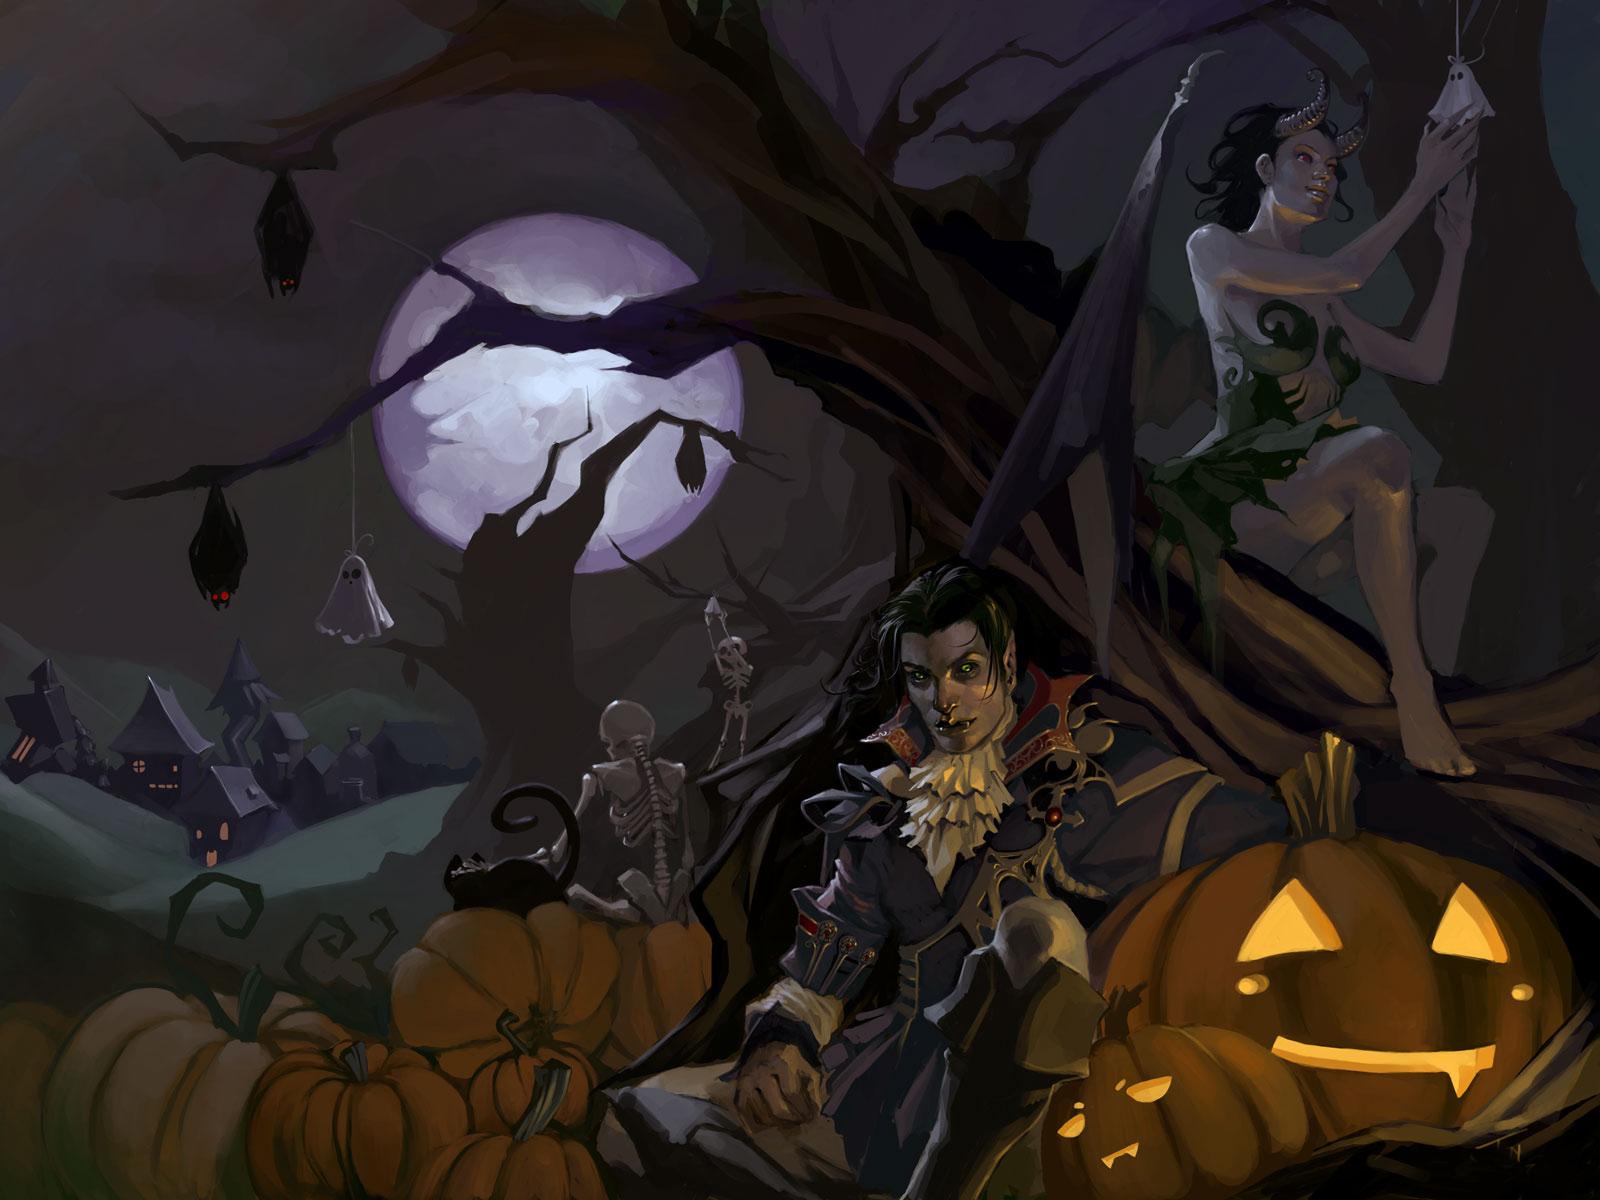 http://3.bp.blogspot.com/-mqmLi7Rl2Wk/Tqvc213KKtI/AAAAAAAAANE/AE0vjtD2lW8/s1600/Cute_Halloween_Wallpapers.jpg